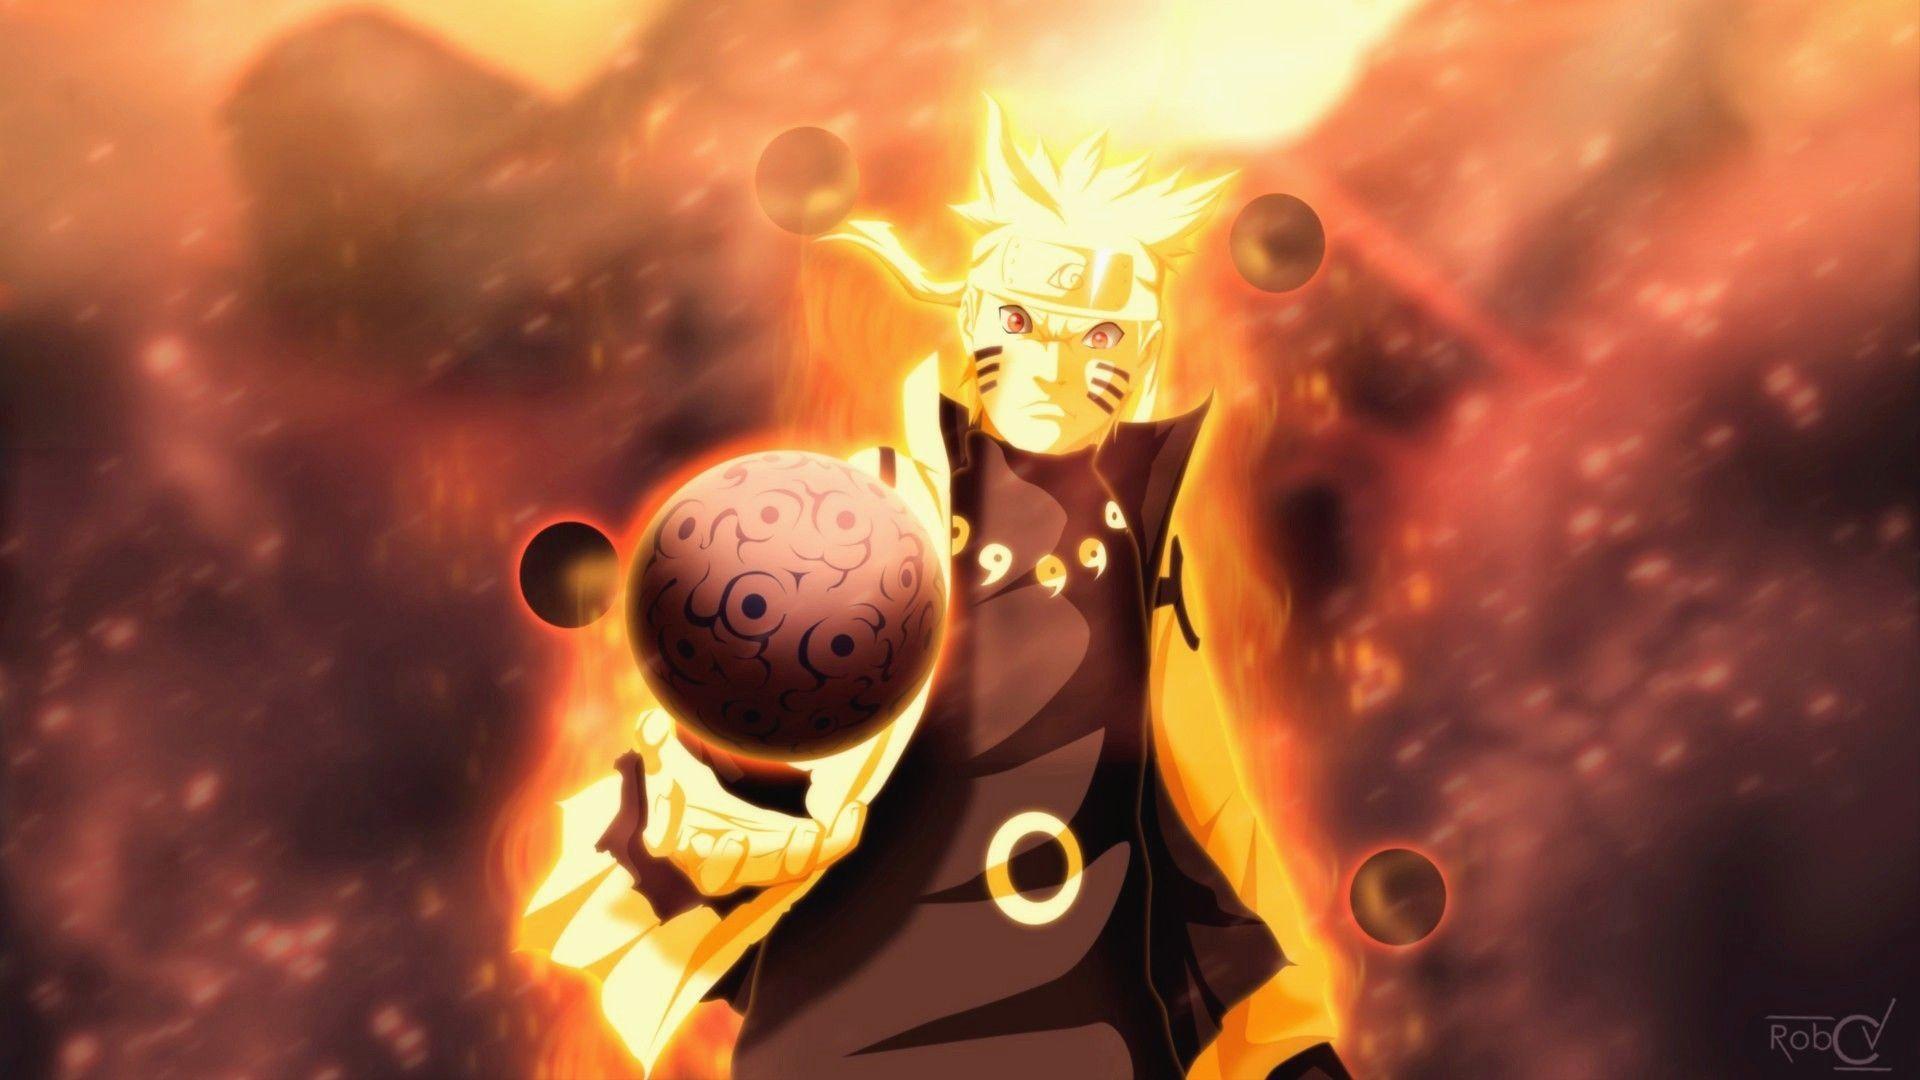 Naruto Shippuden Fond Decran Hd